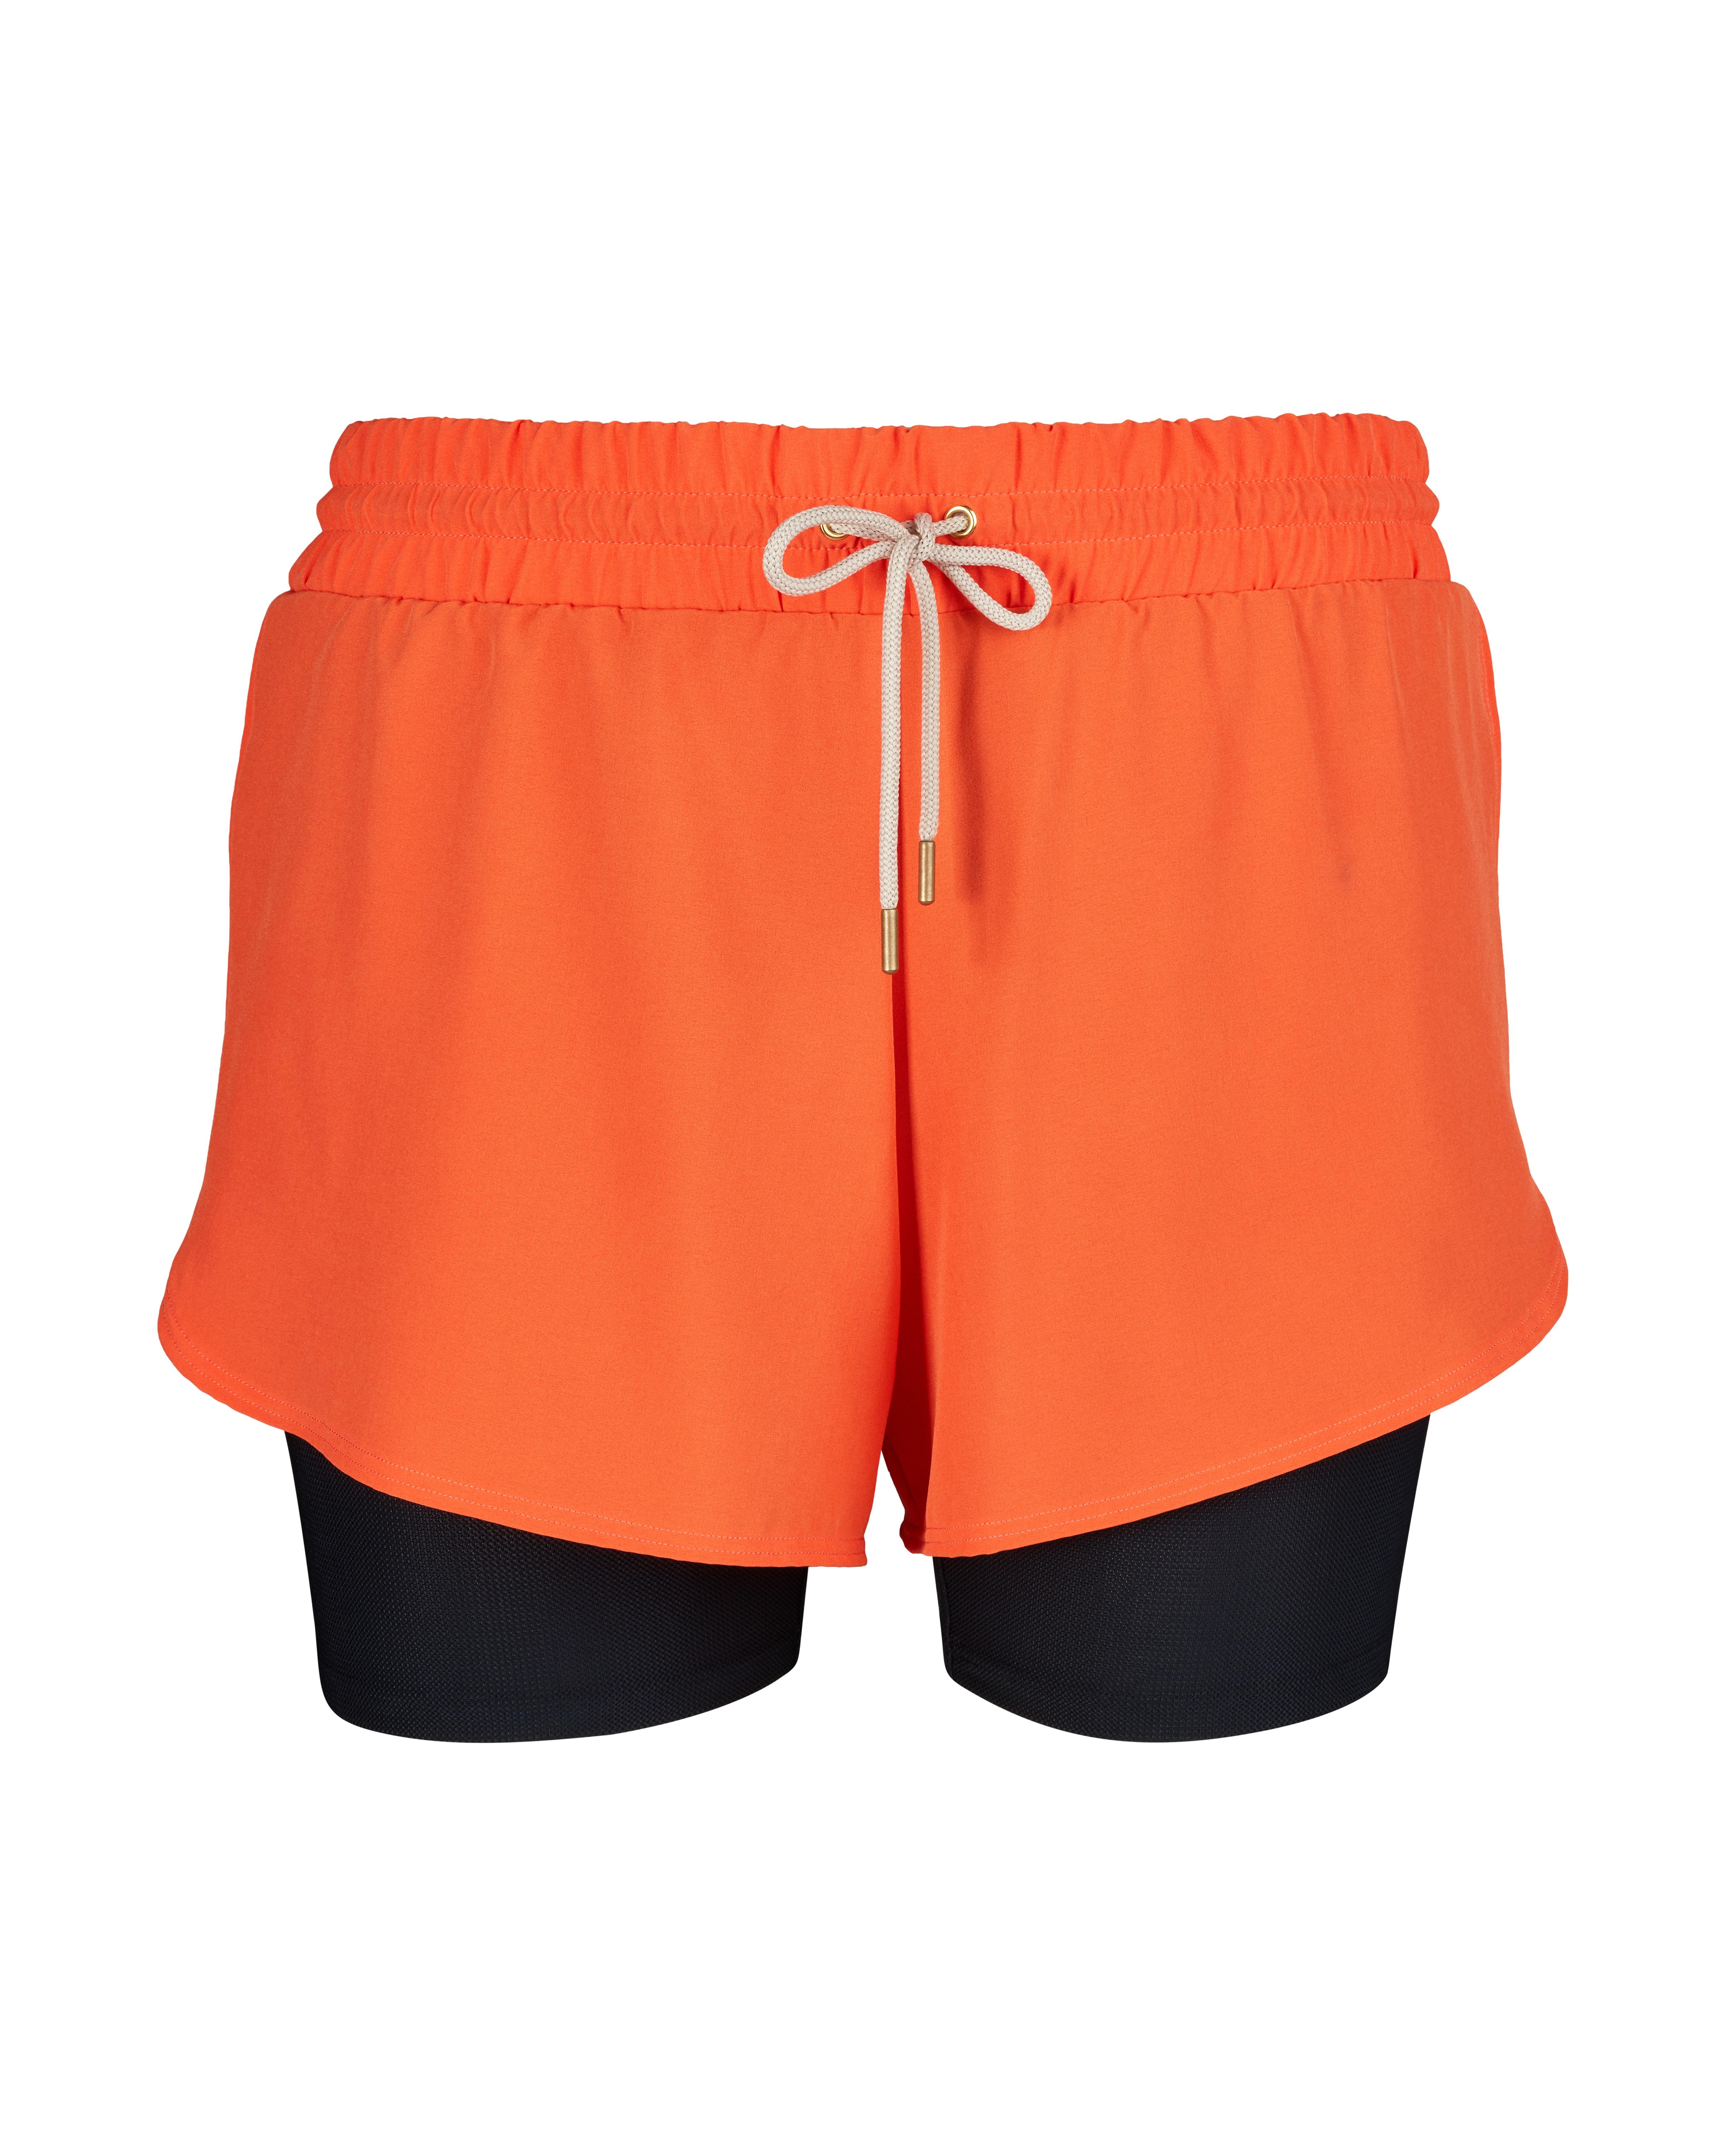 Skiny Shorts - Blazing Orange